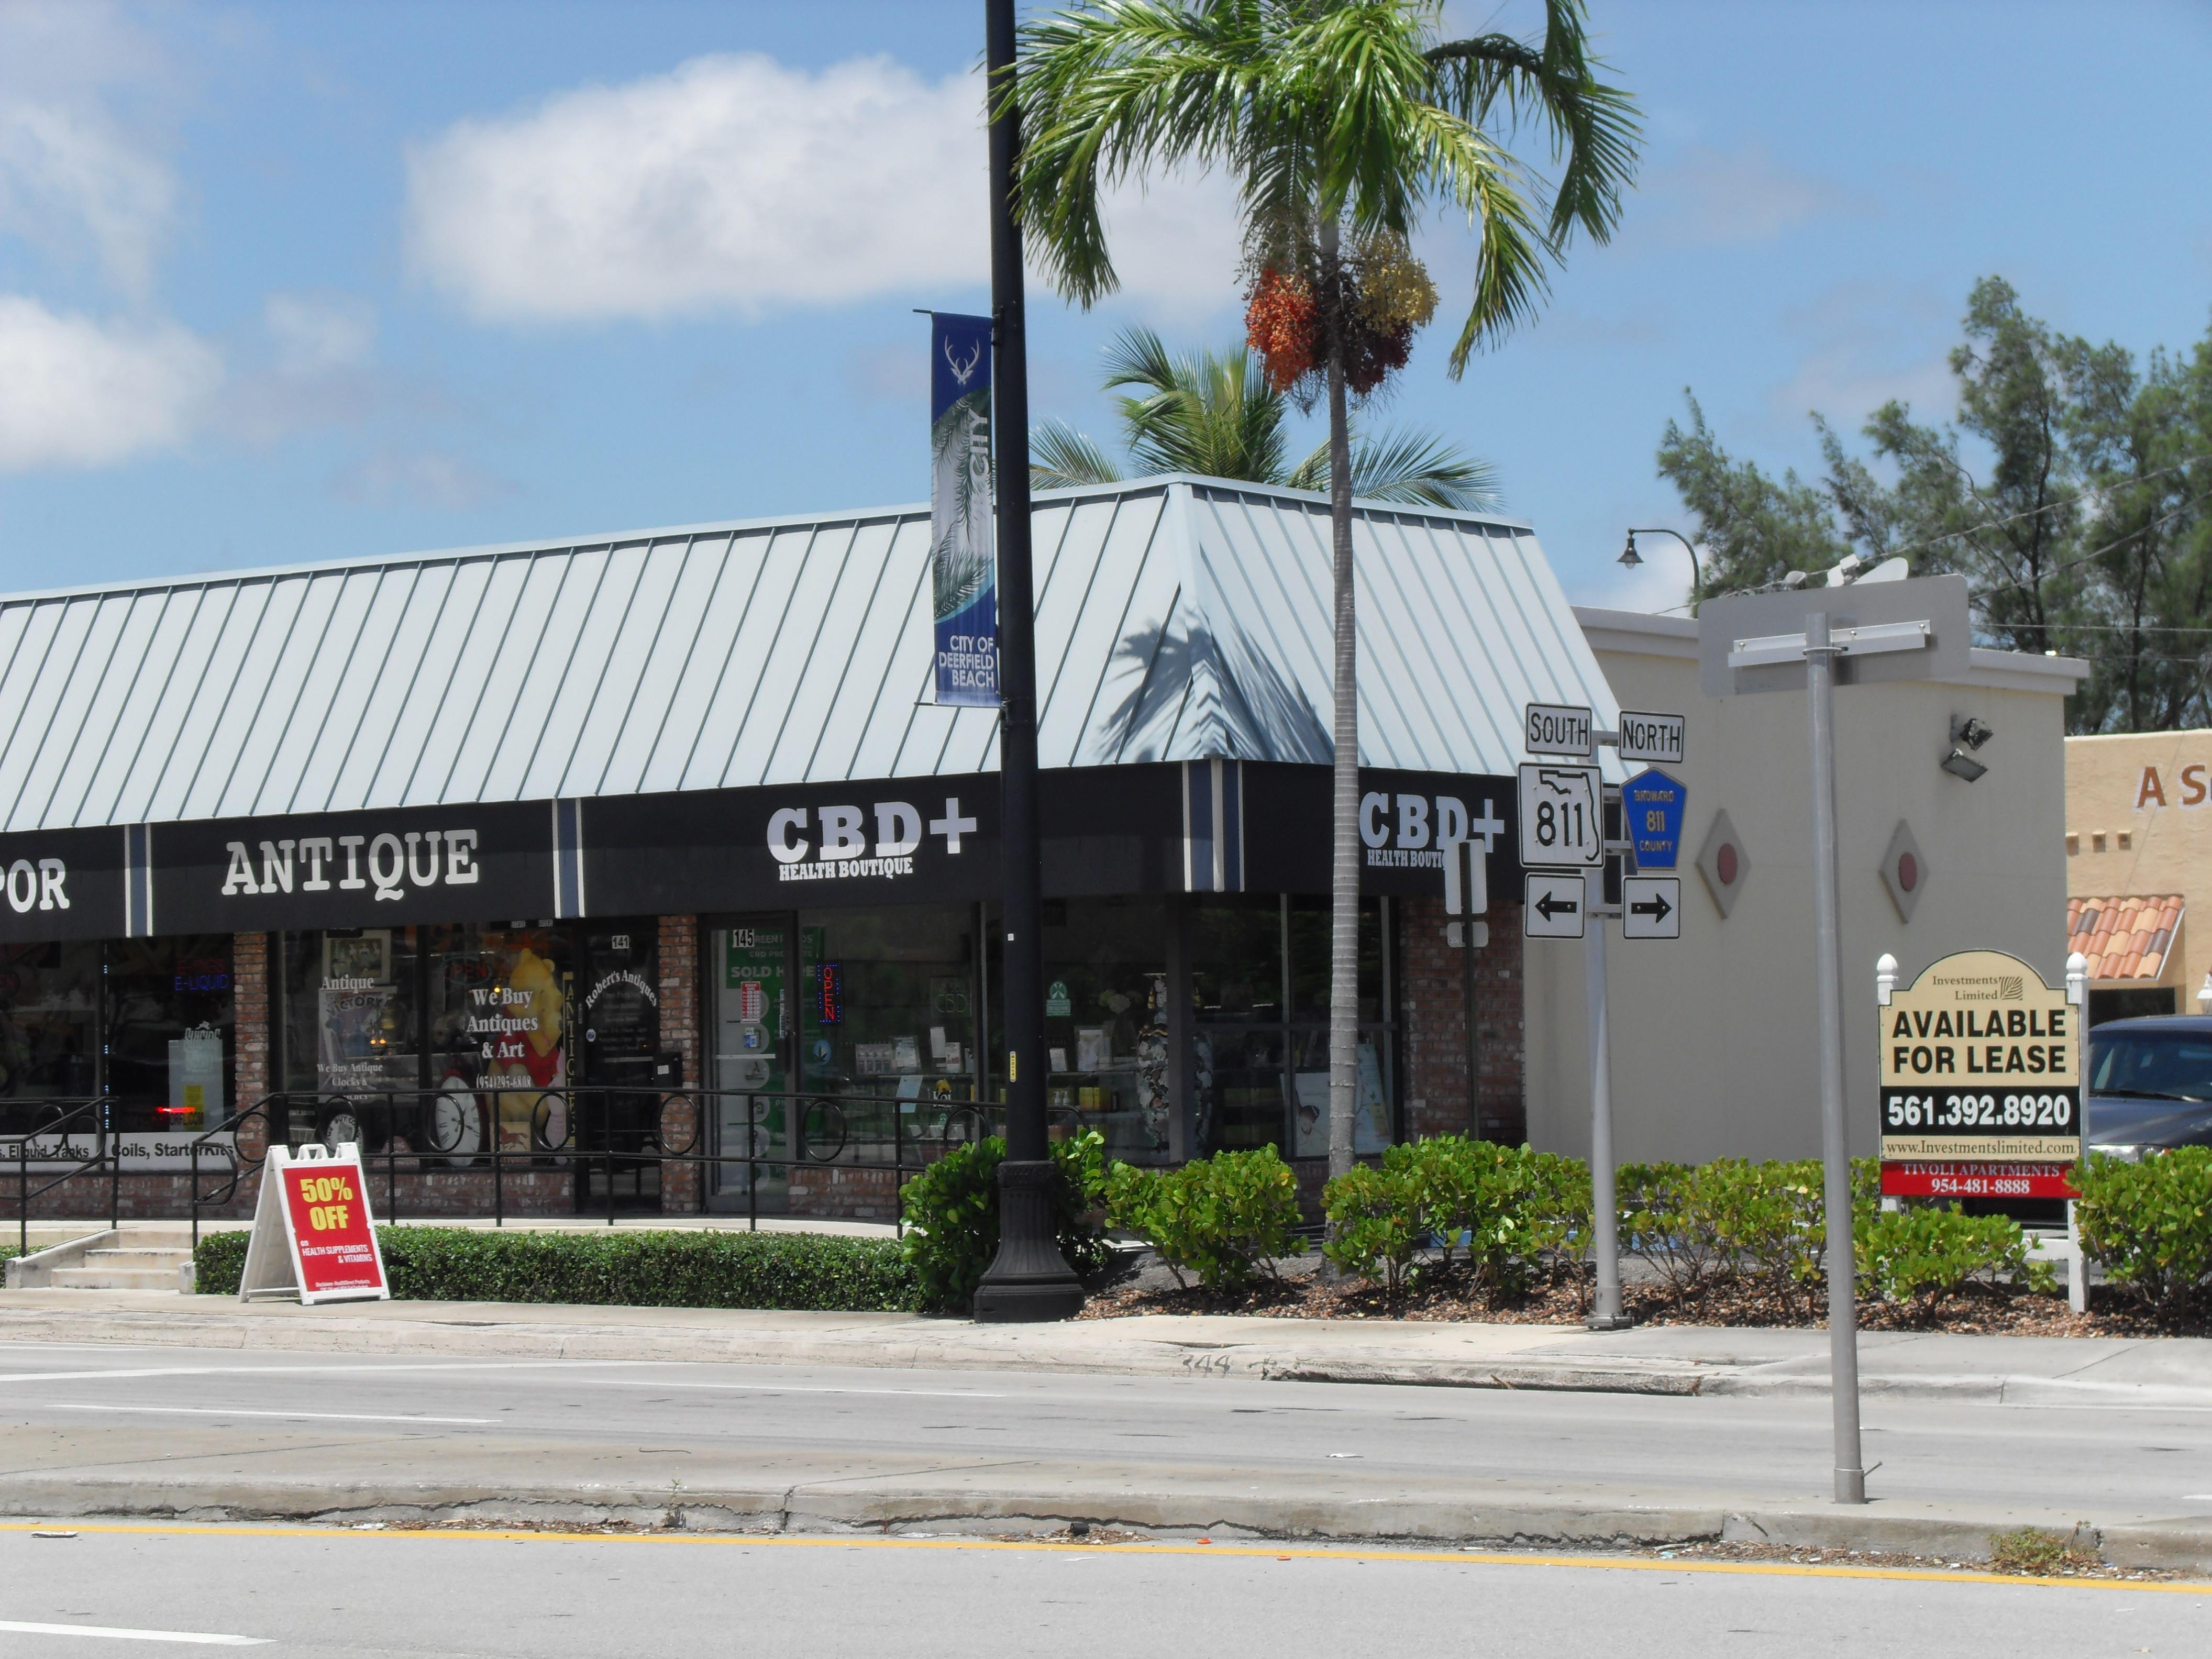 CBD + Health Boutique of Deerfield Beach